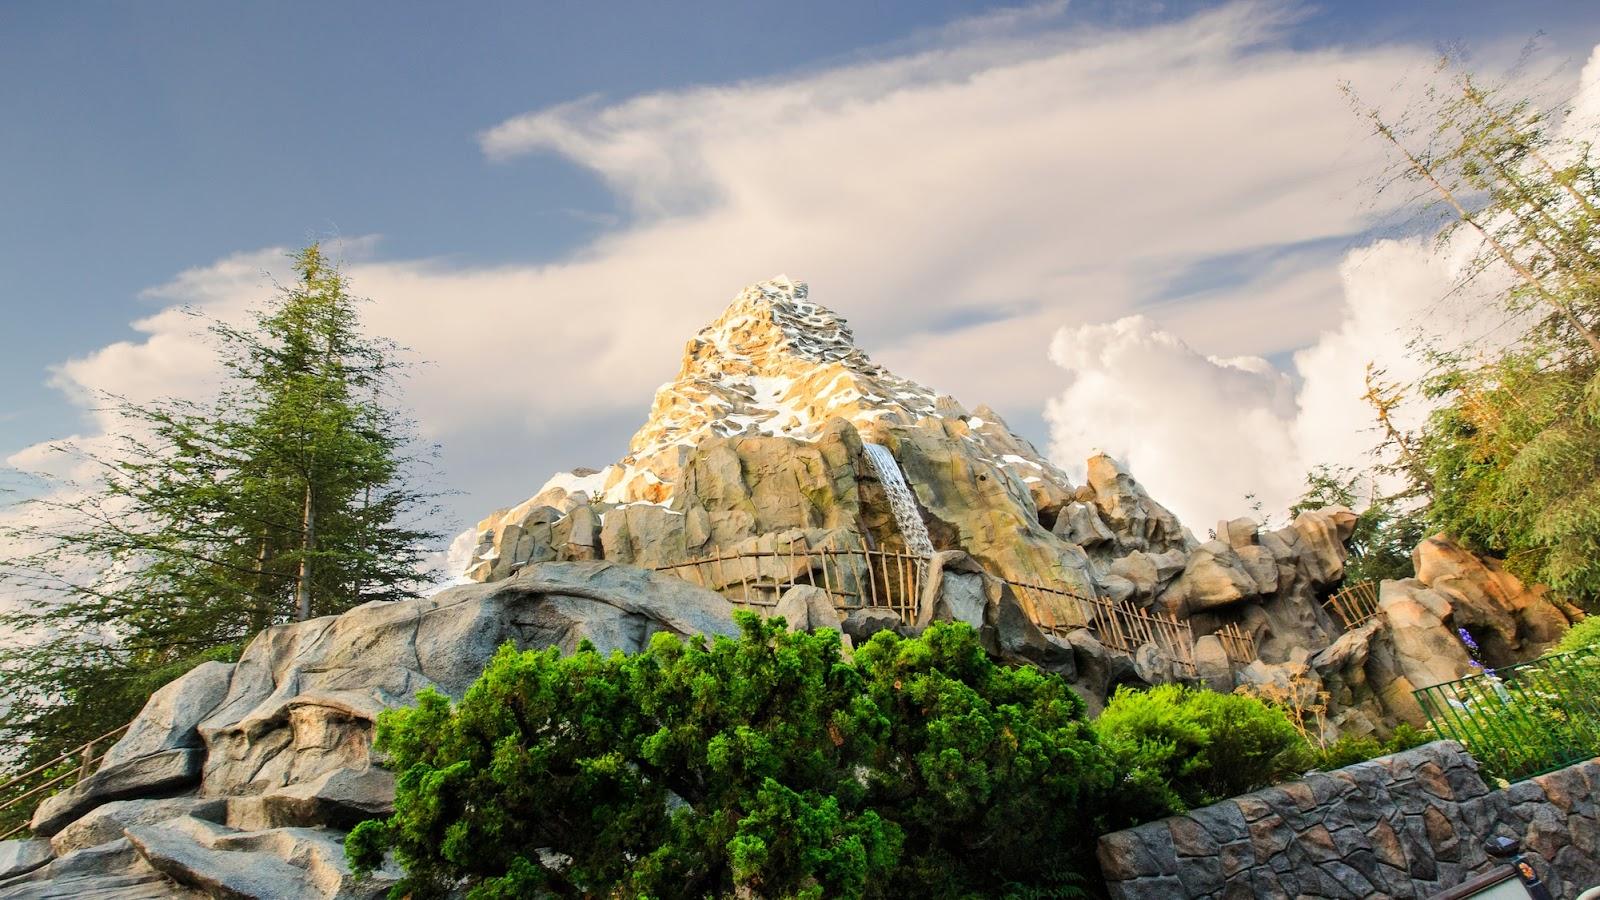 Via Disneyland